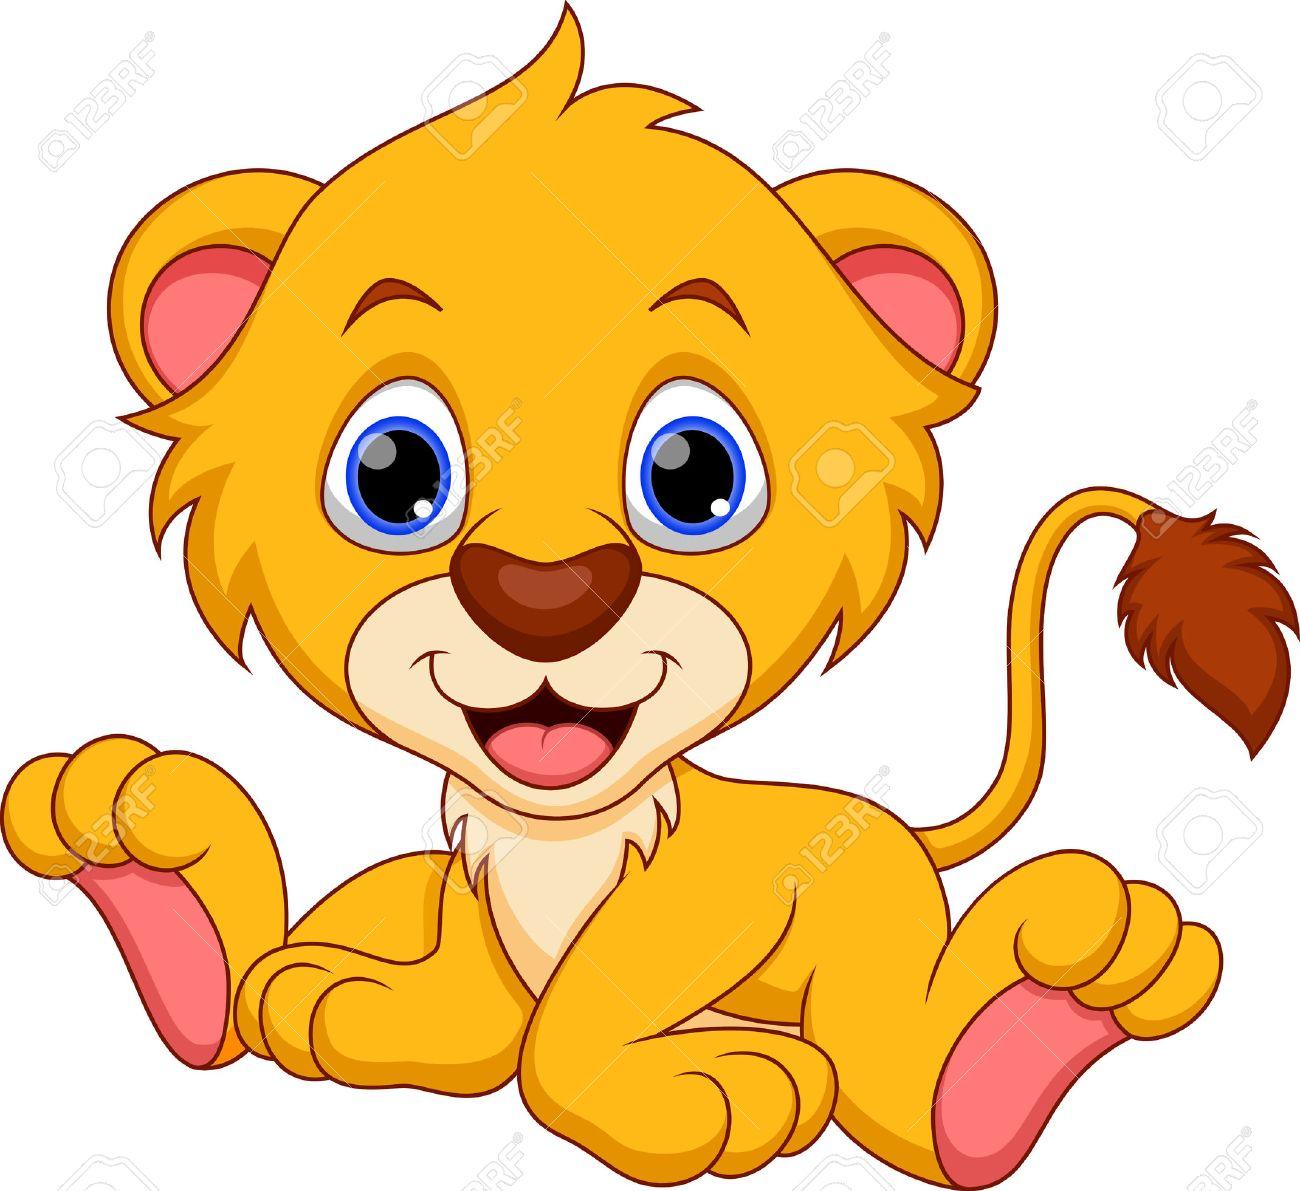 cute baby lion cartoon royalty free cliparts vectors and stock rh 123rf com lion cub clipart black and white free lion cub clipart